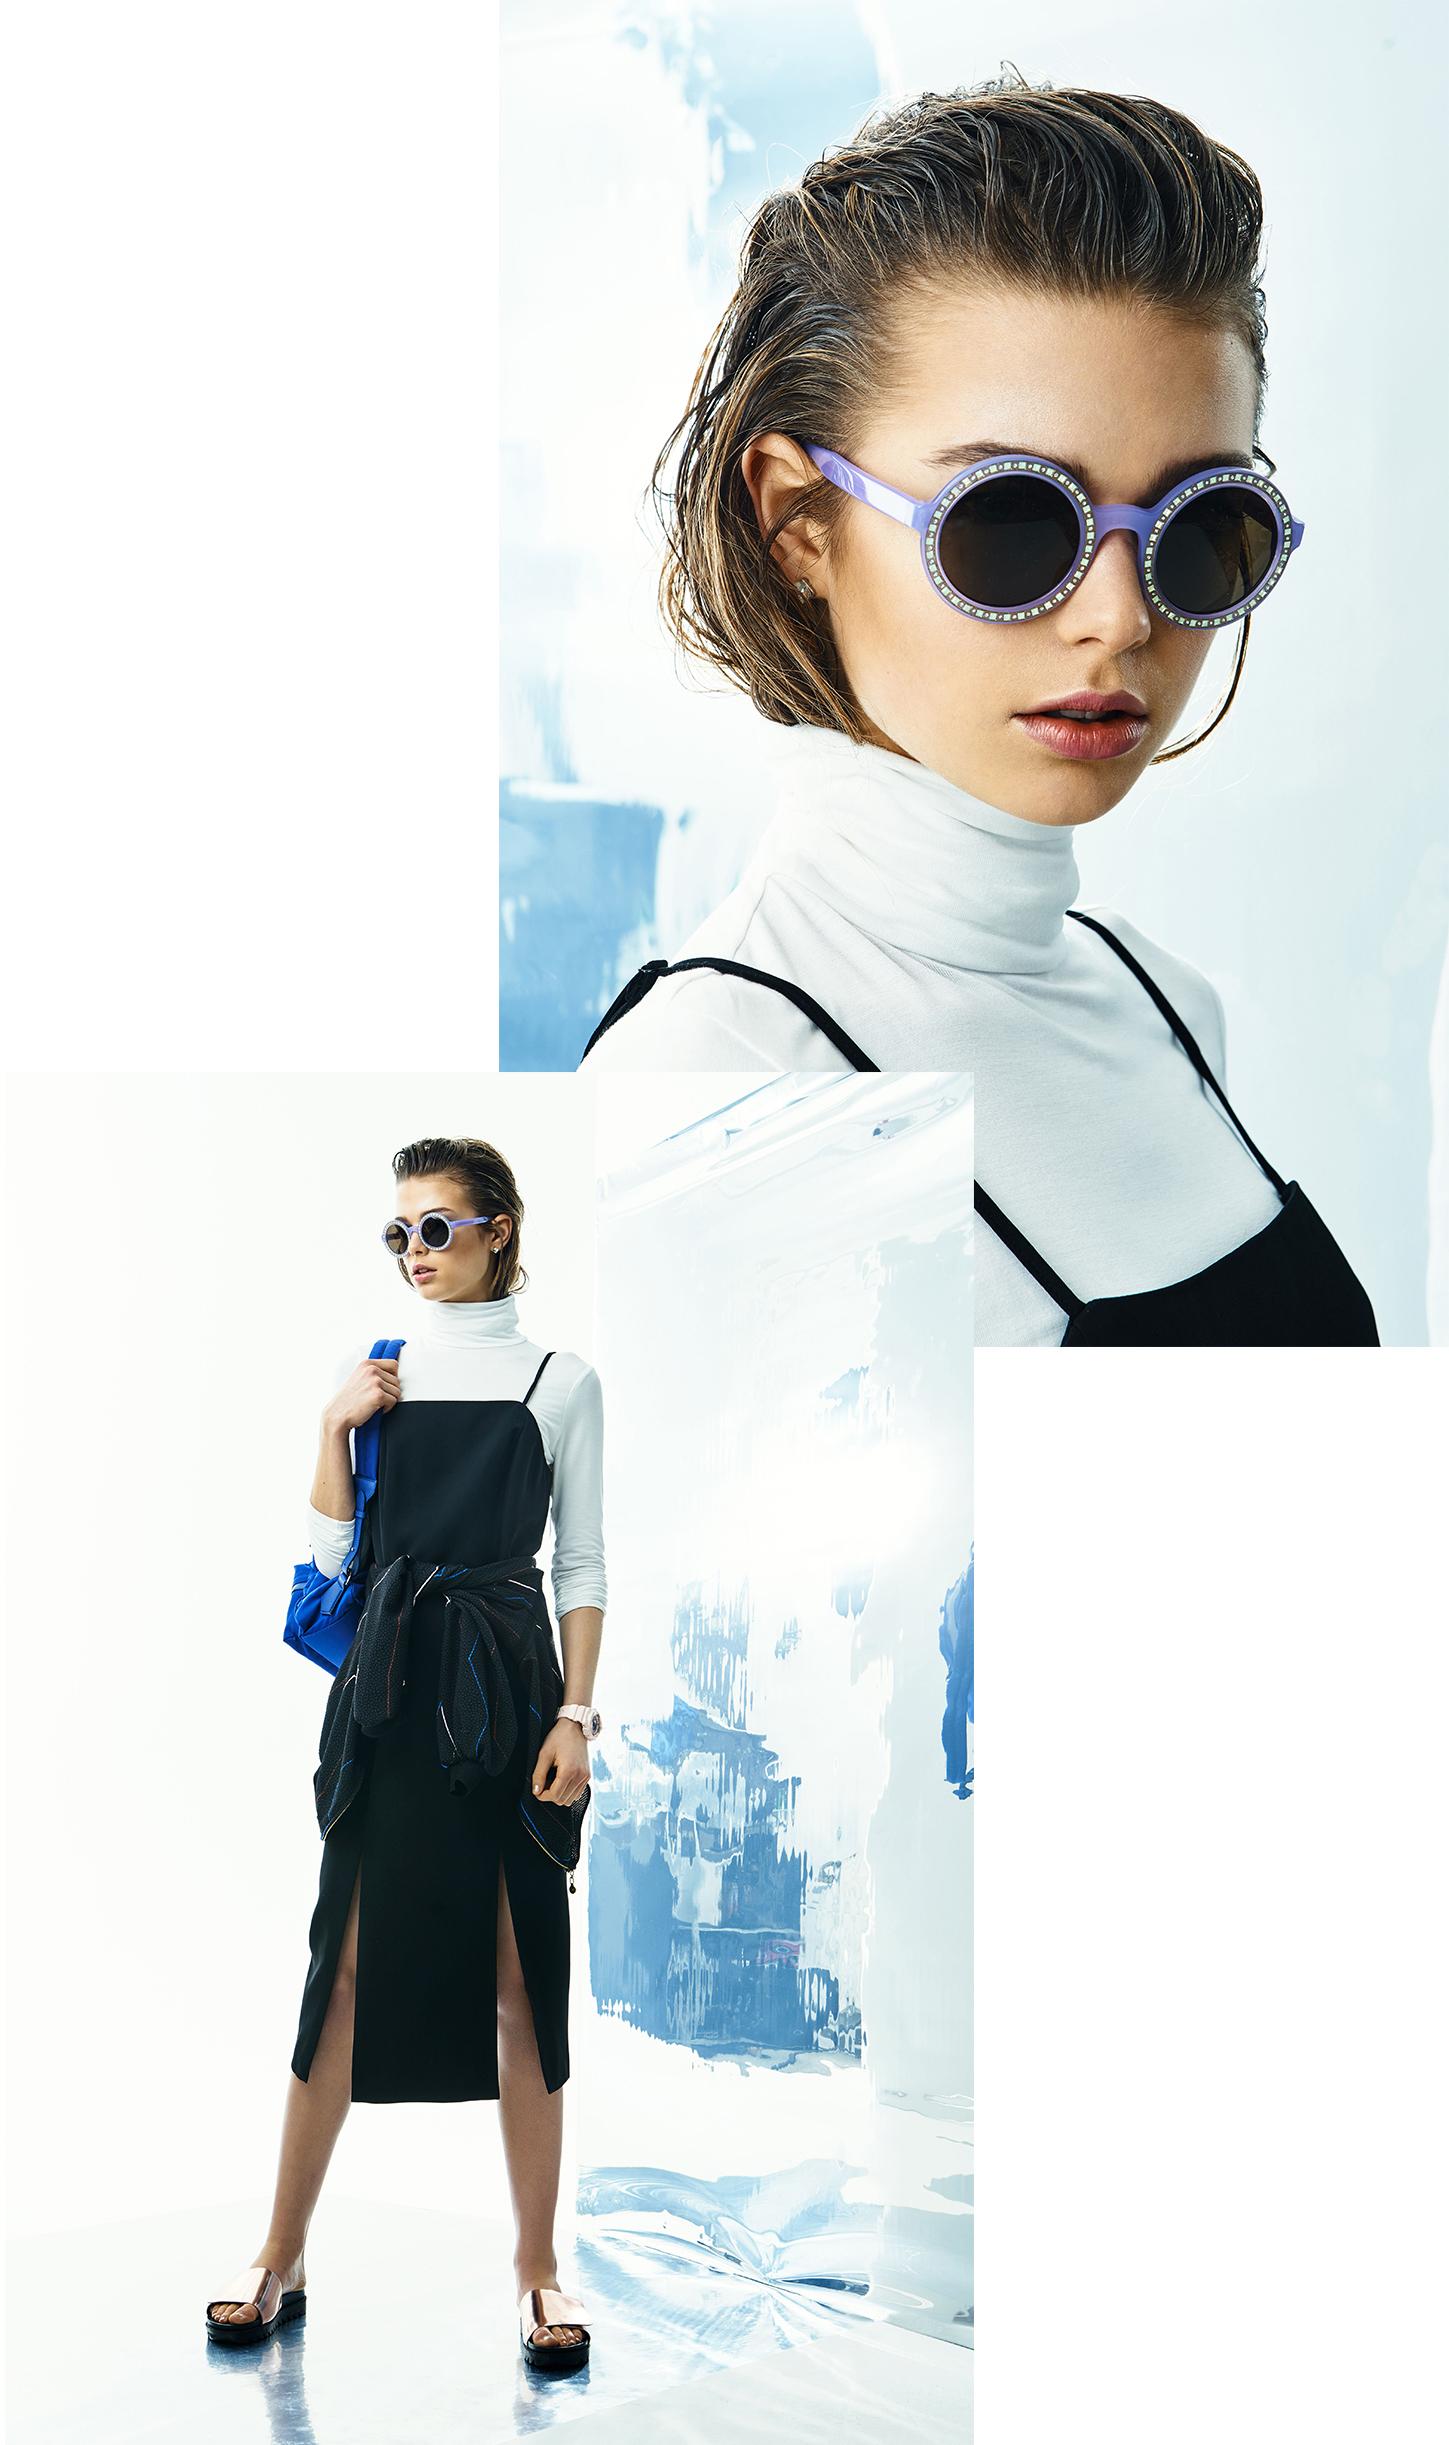 Polo neck, Splendid;dress,C/MEO Collective; jacket, Stine Goya;backpack, Patrizia Pepe;sunglasses,Andy Wolf;earrings, Yael; shoes, Privada